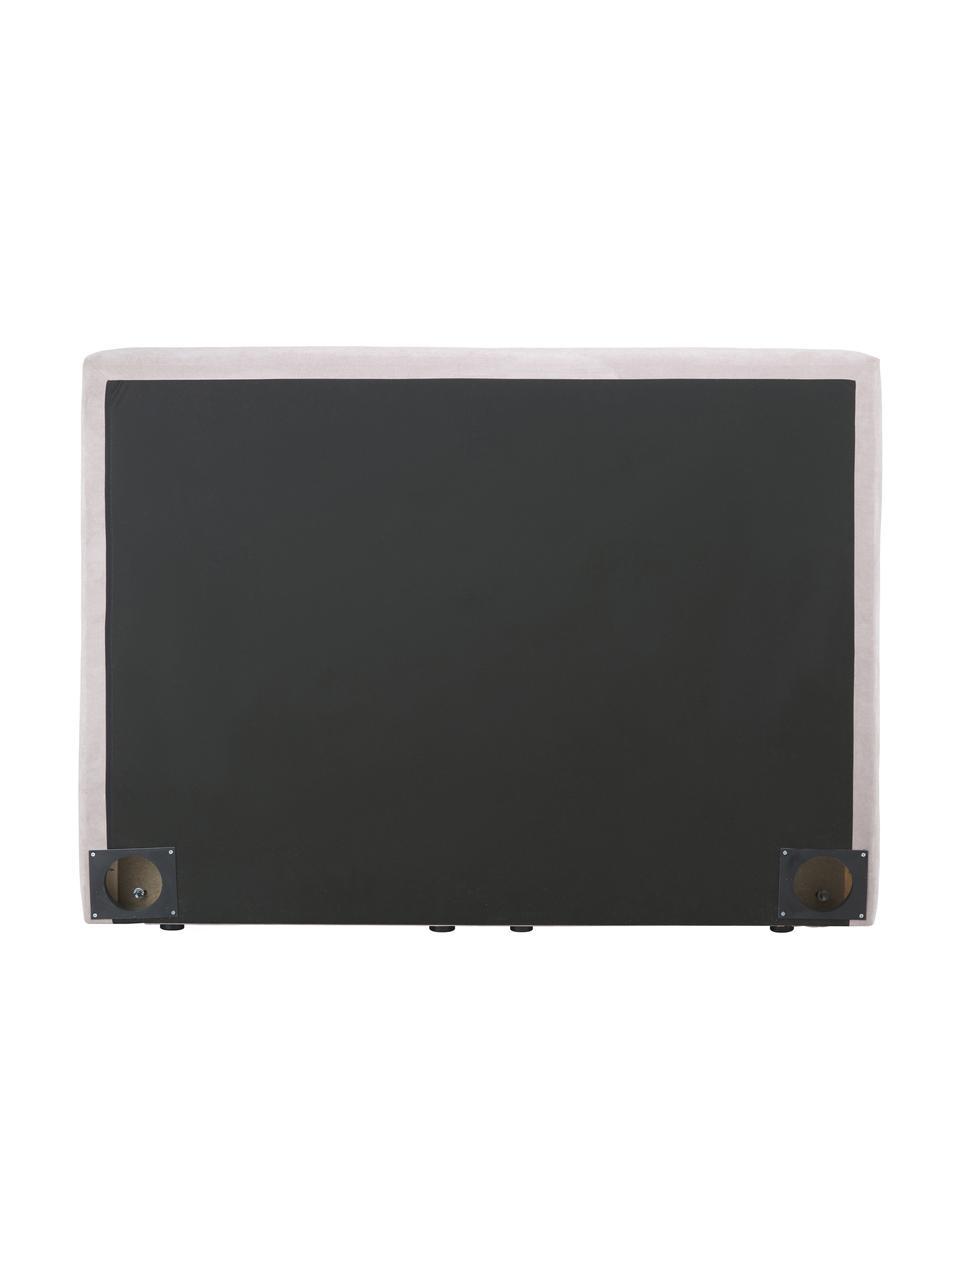 Boxspringbett Oberon in Rosa, Matratze: 5-Zonen-Taschenfederkern, Füße: Kunststoff, Webstoff Rosa, 200 x 200 cm